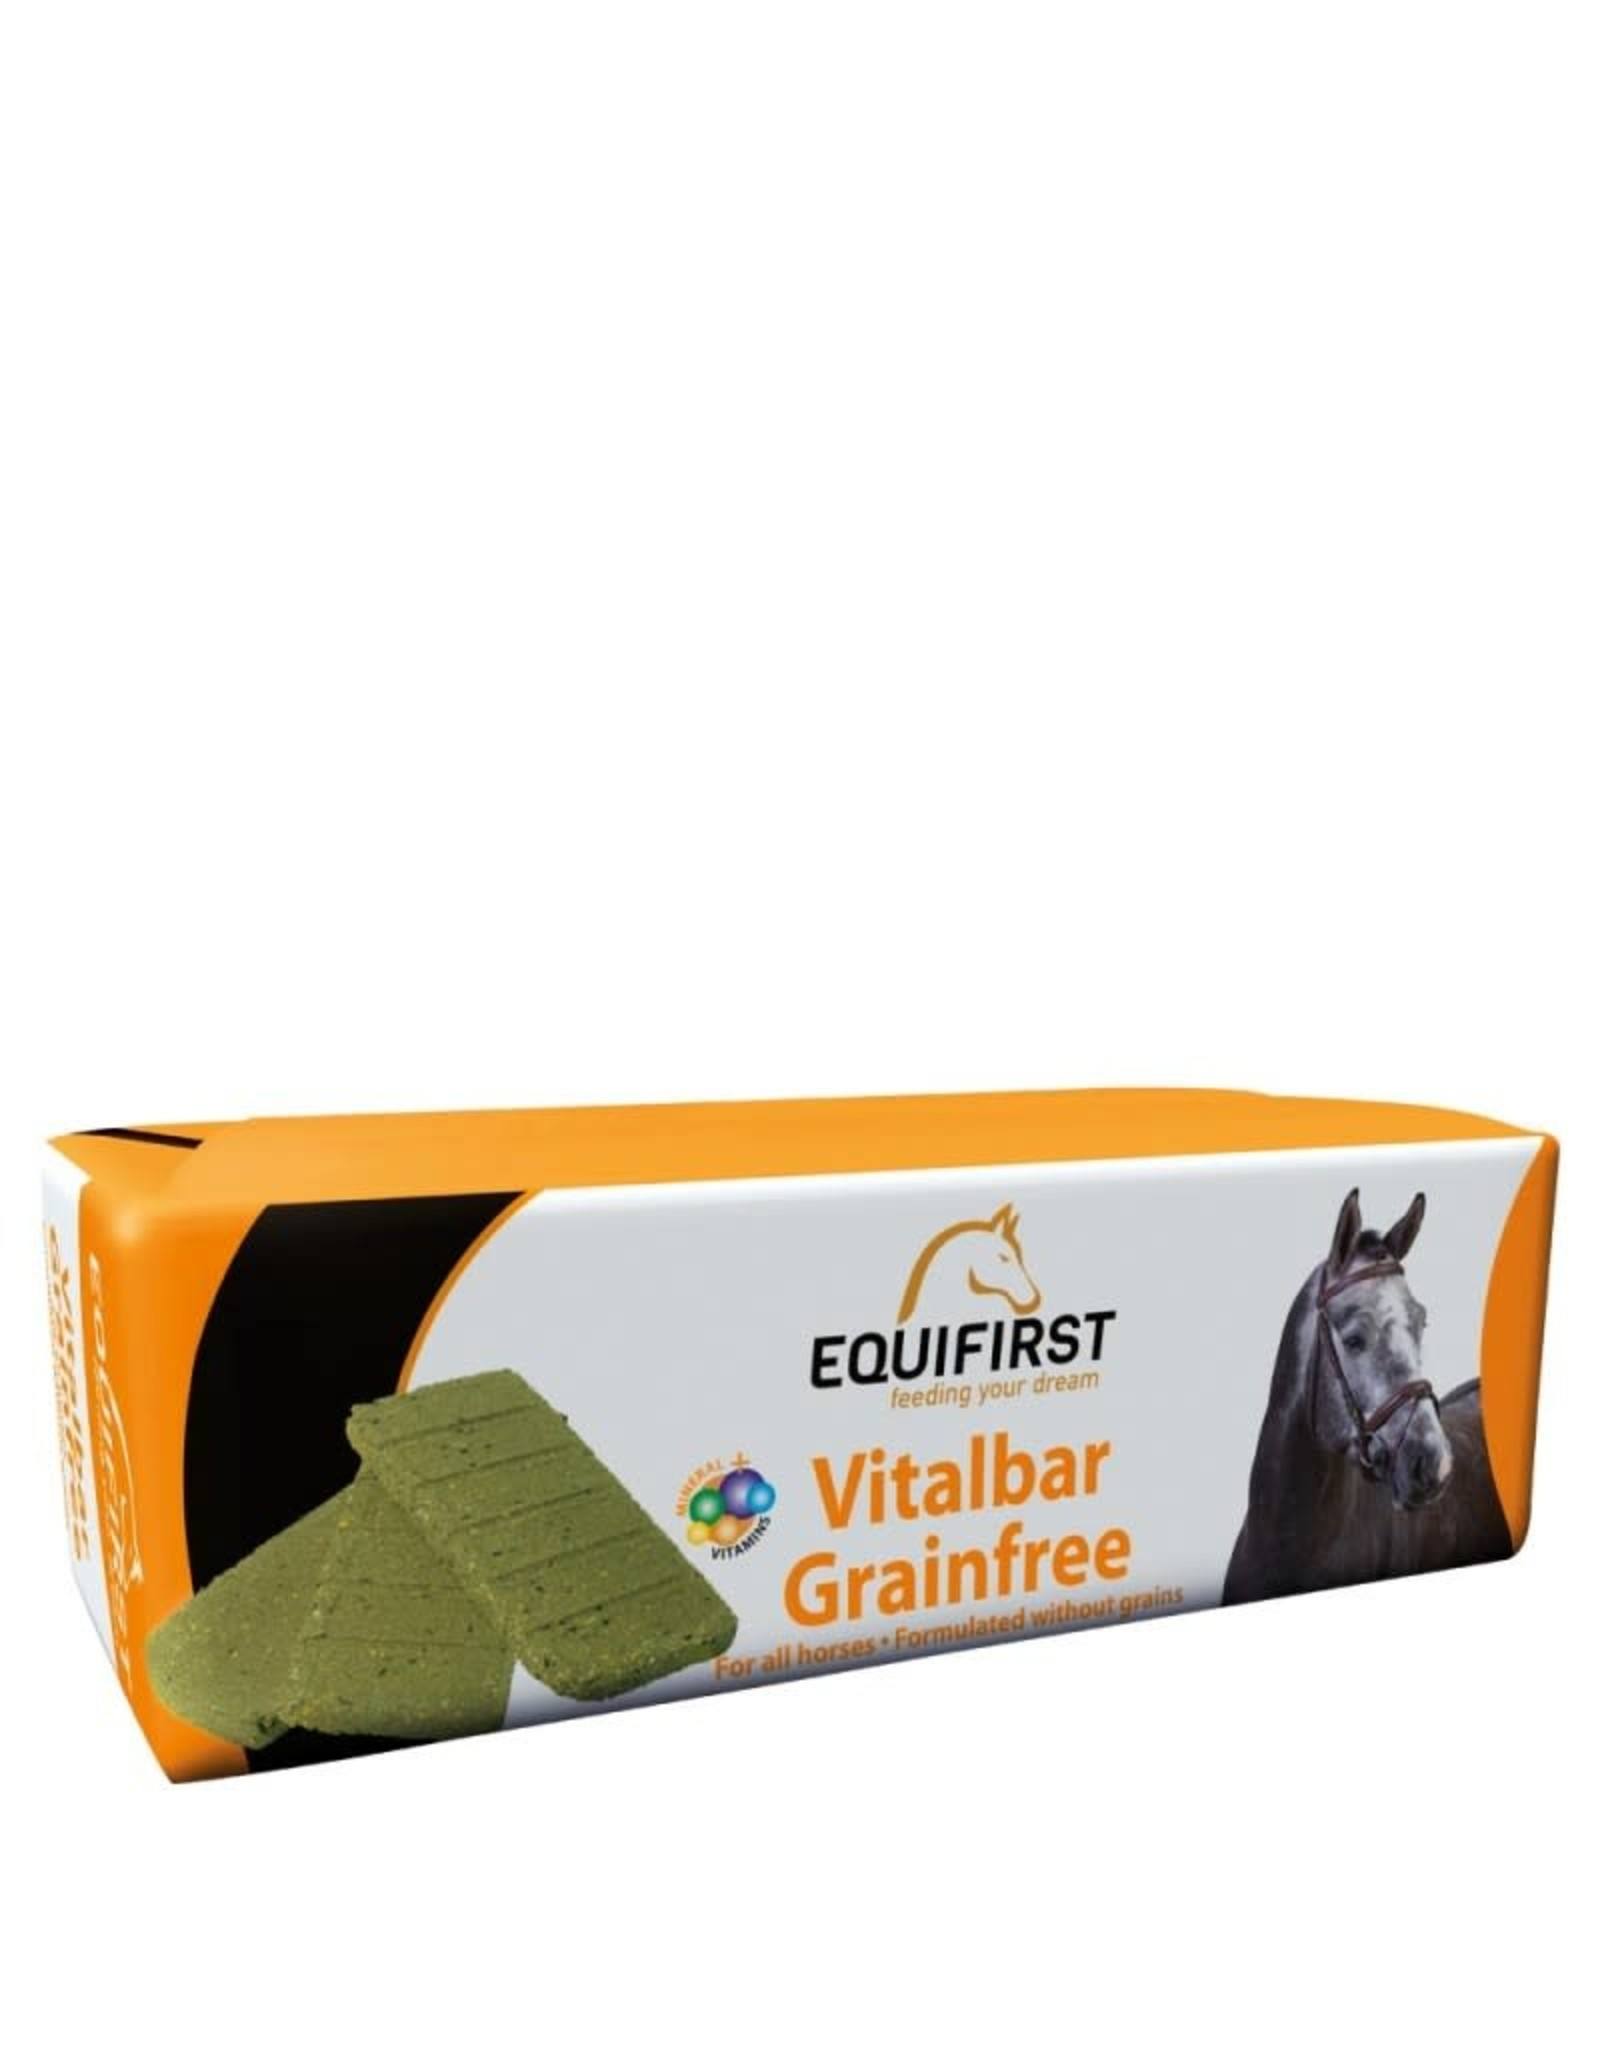 Equifirst Equifirst Vitalbar Grainfree